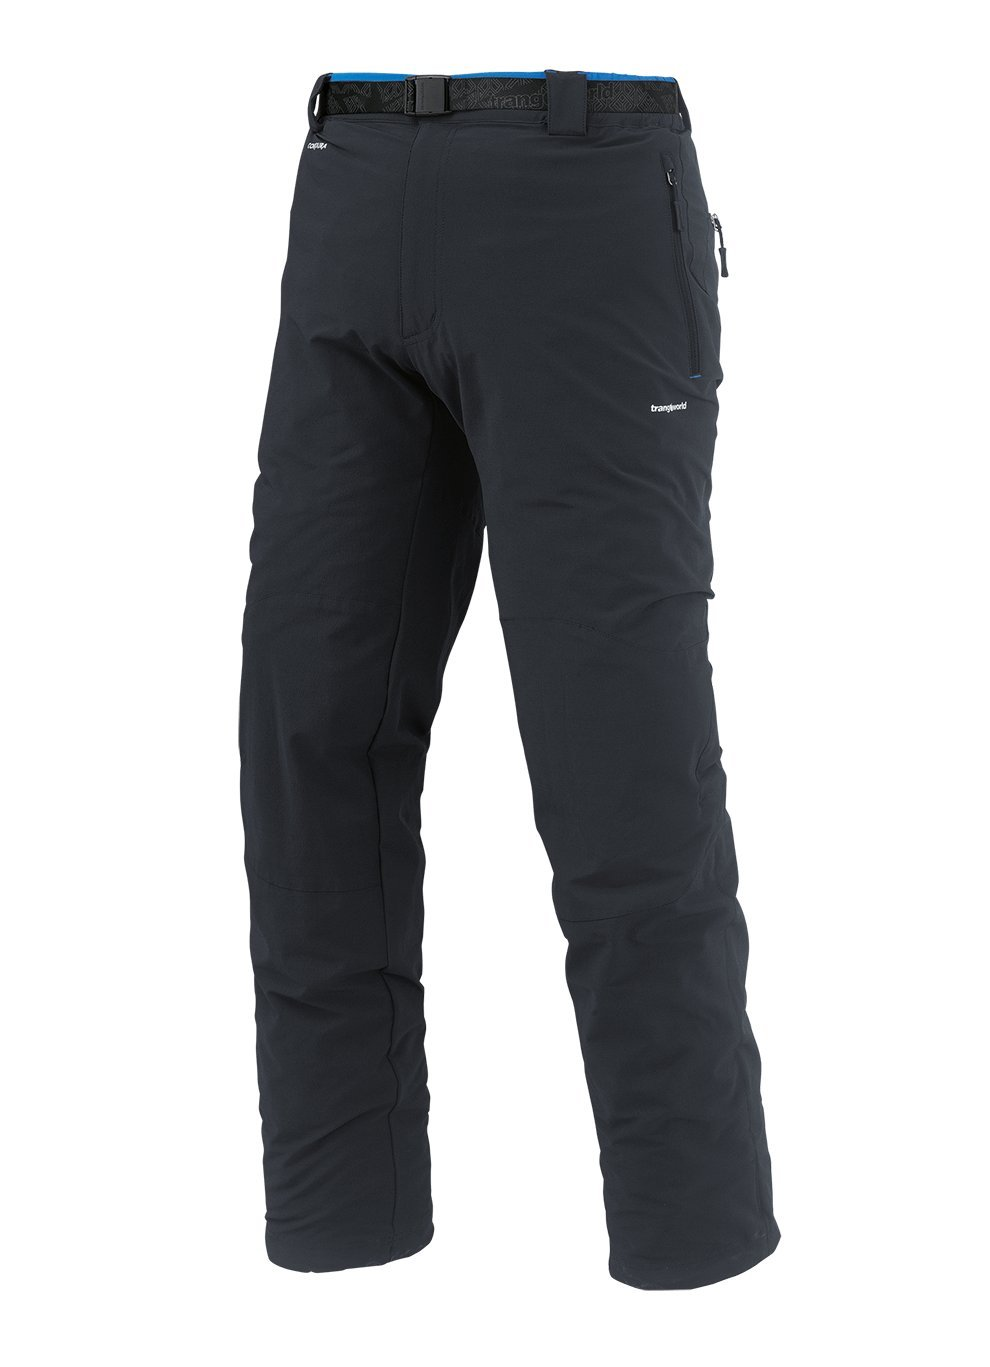 Noir Trangoworld Hoan Pantalons Longs L